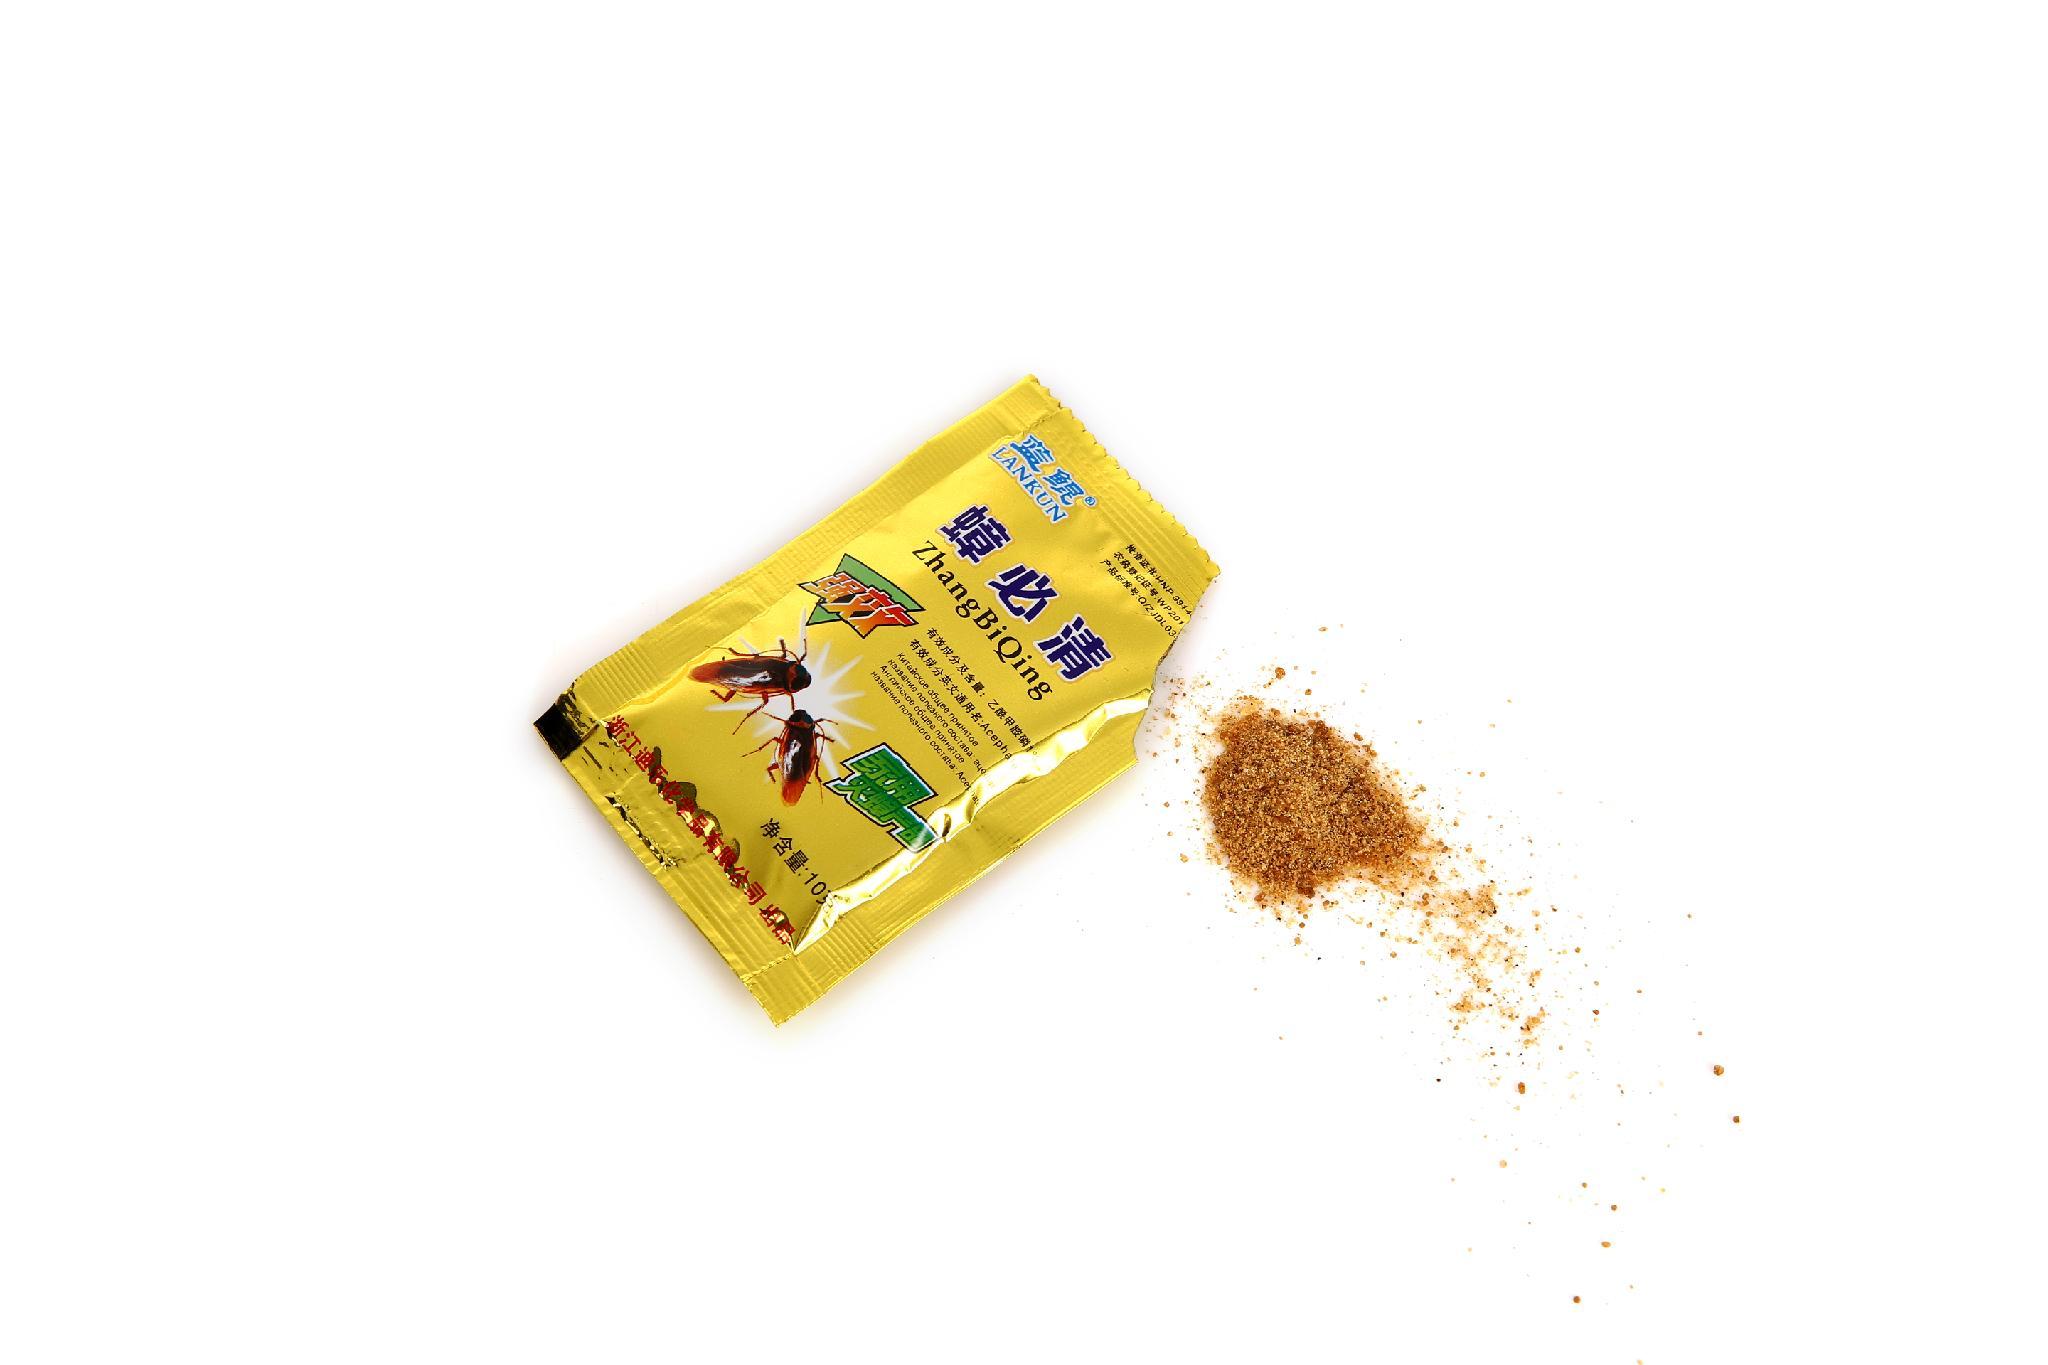 1%Acephate attractant cockroach killing bait powder trap 2